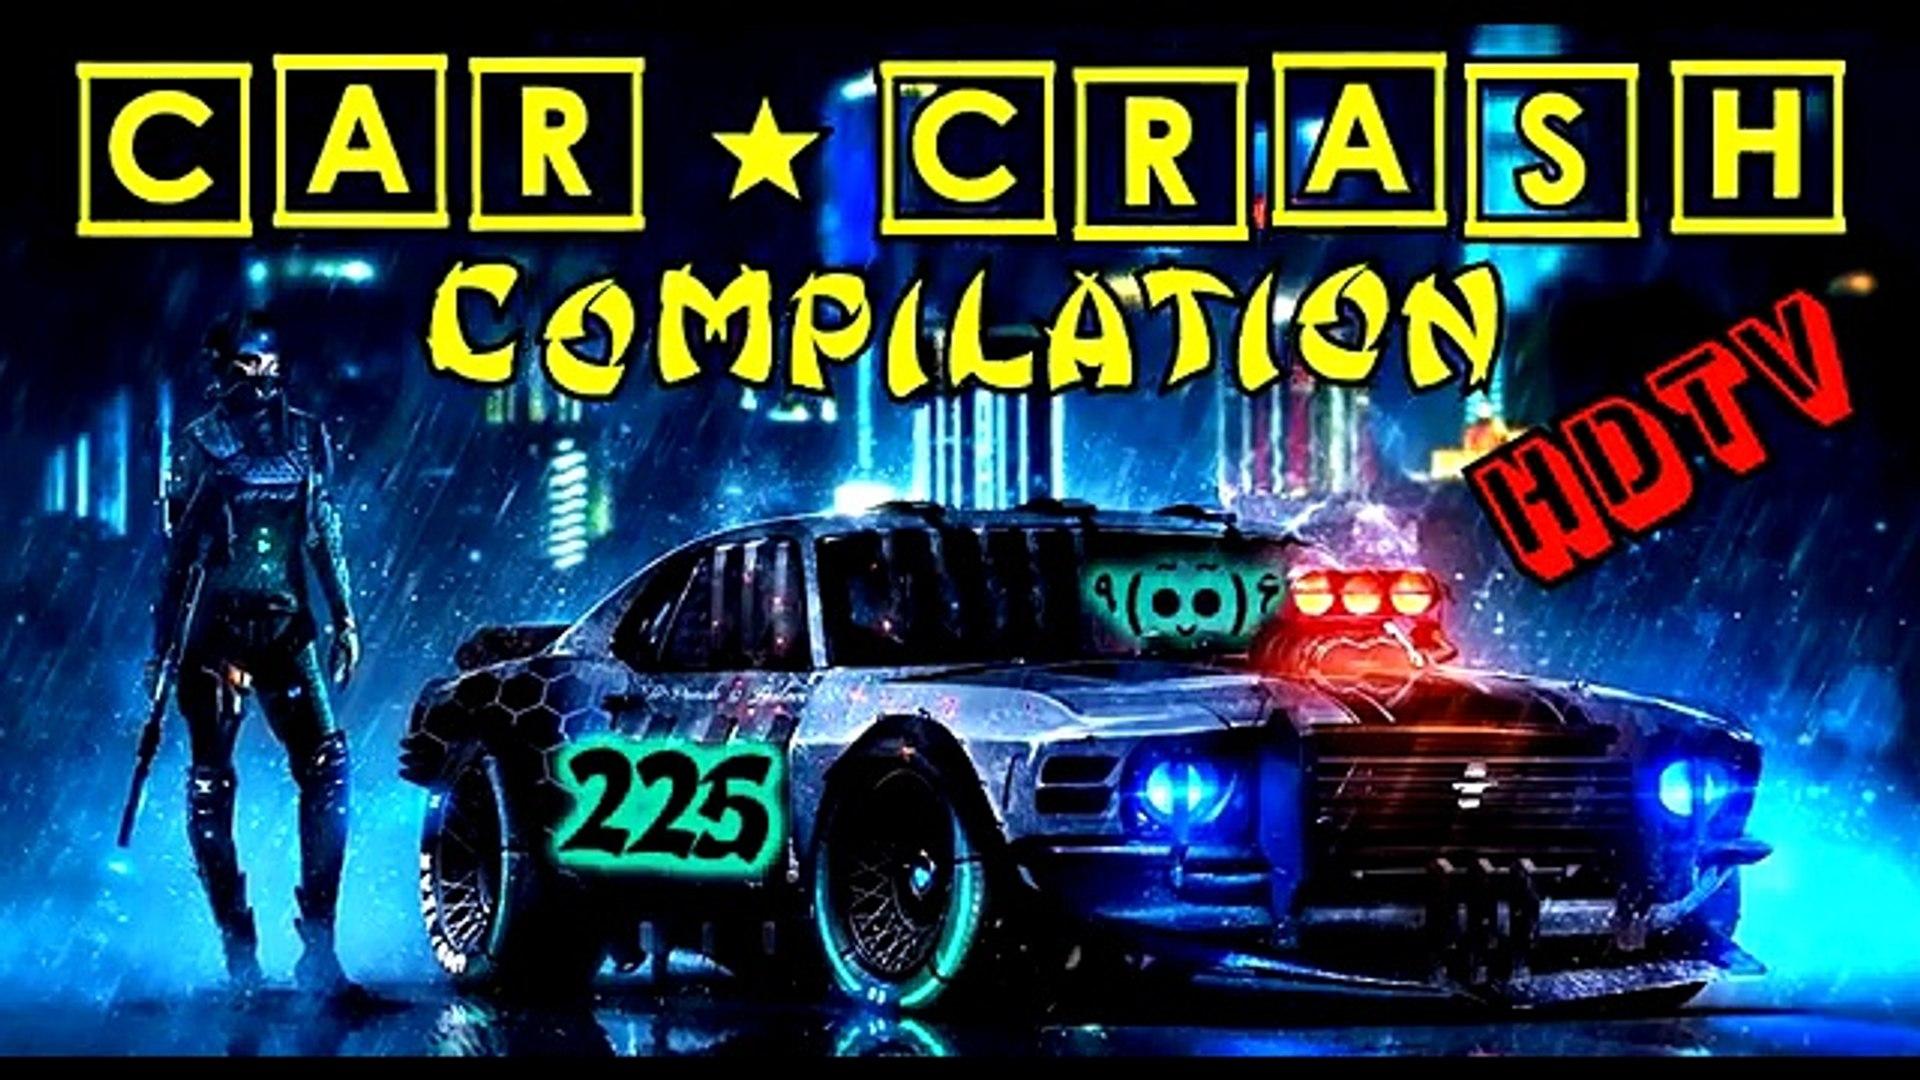 Help on the road Humanity Help each other Помощь на дороге Человечность Car Crash Compilation HDTV